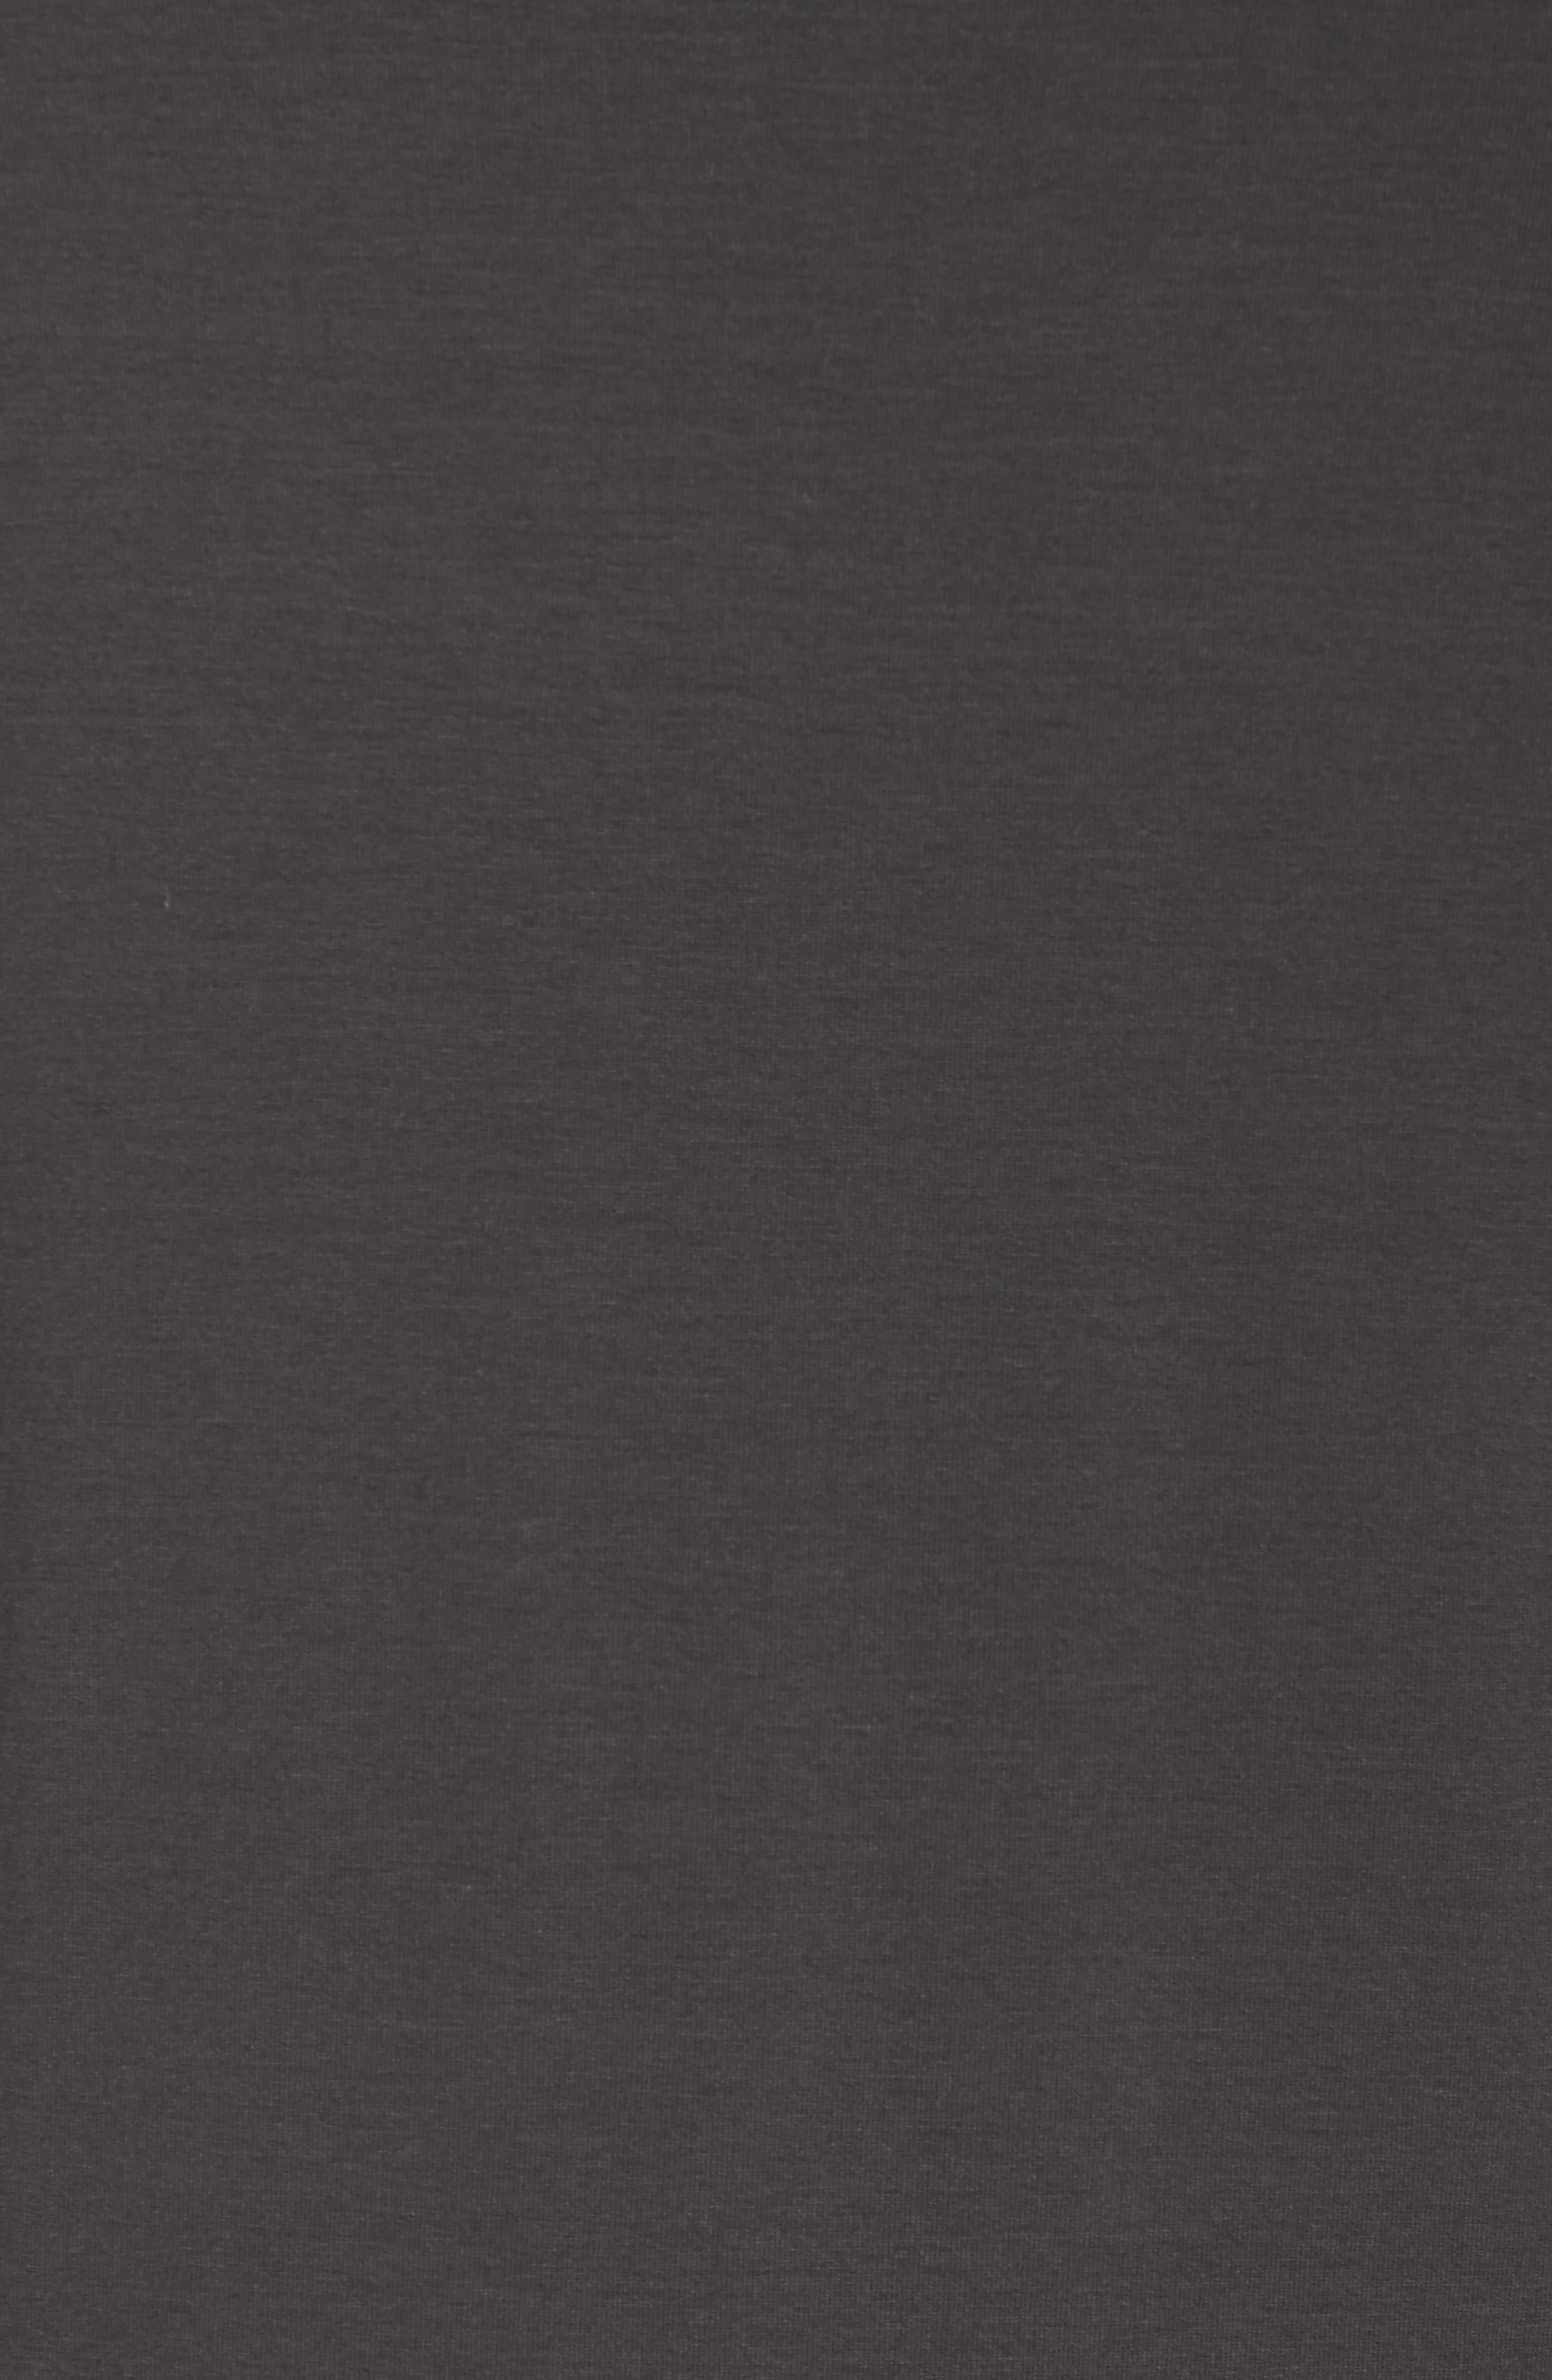 Scoop Neck Jersey Dress,                             Alternate thumbnail 5, color,                             Graphite